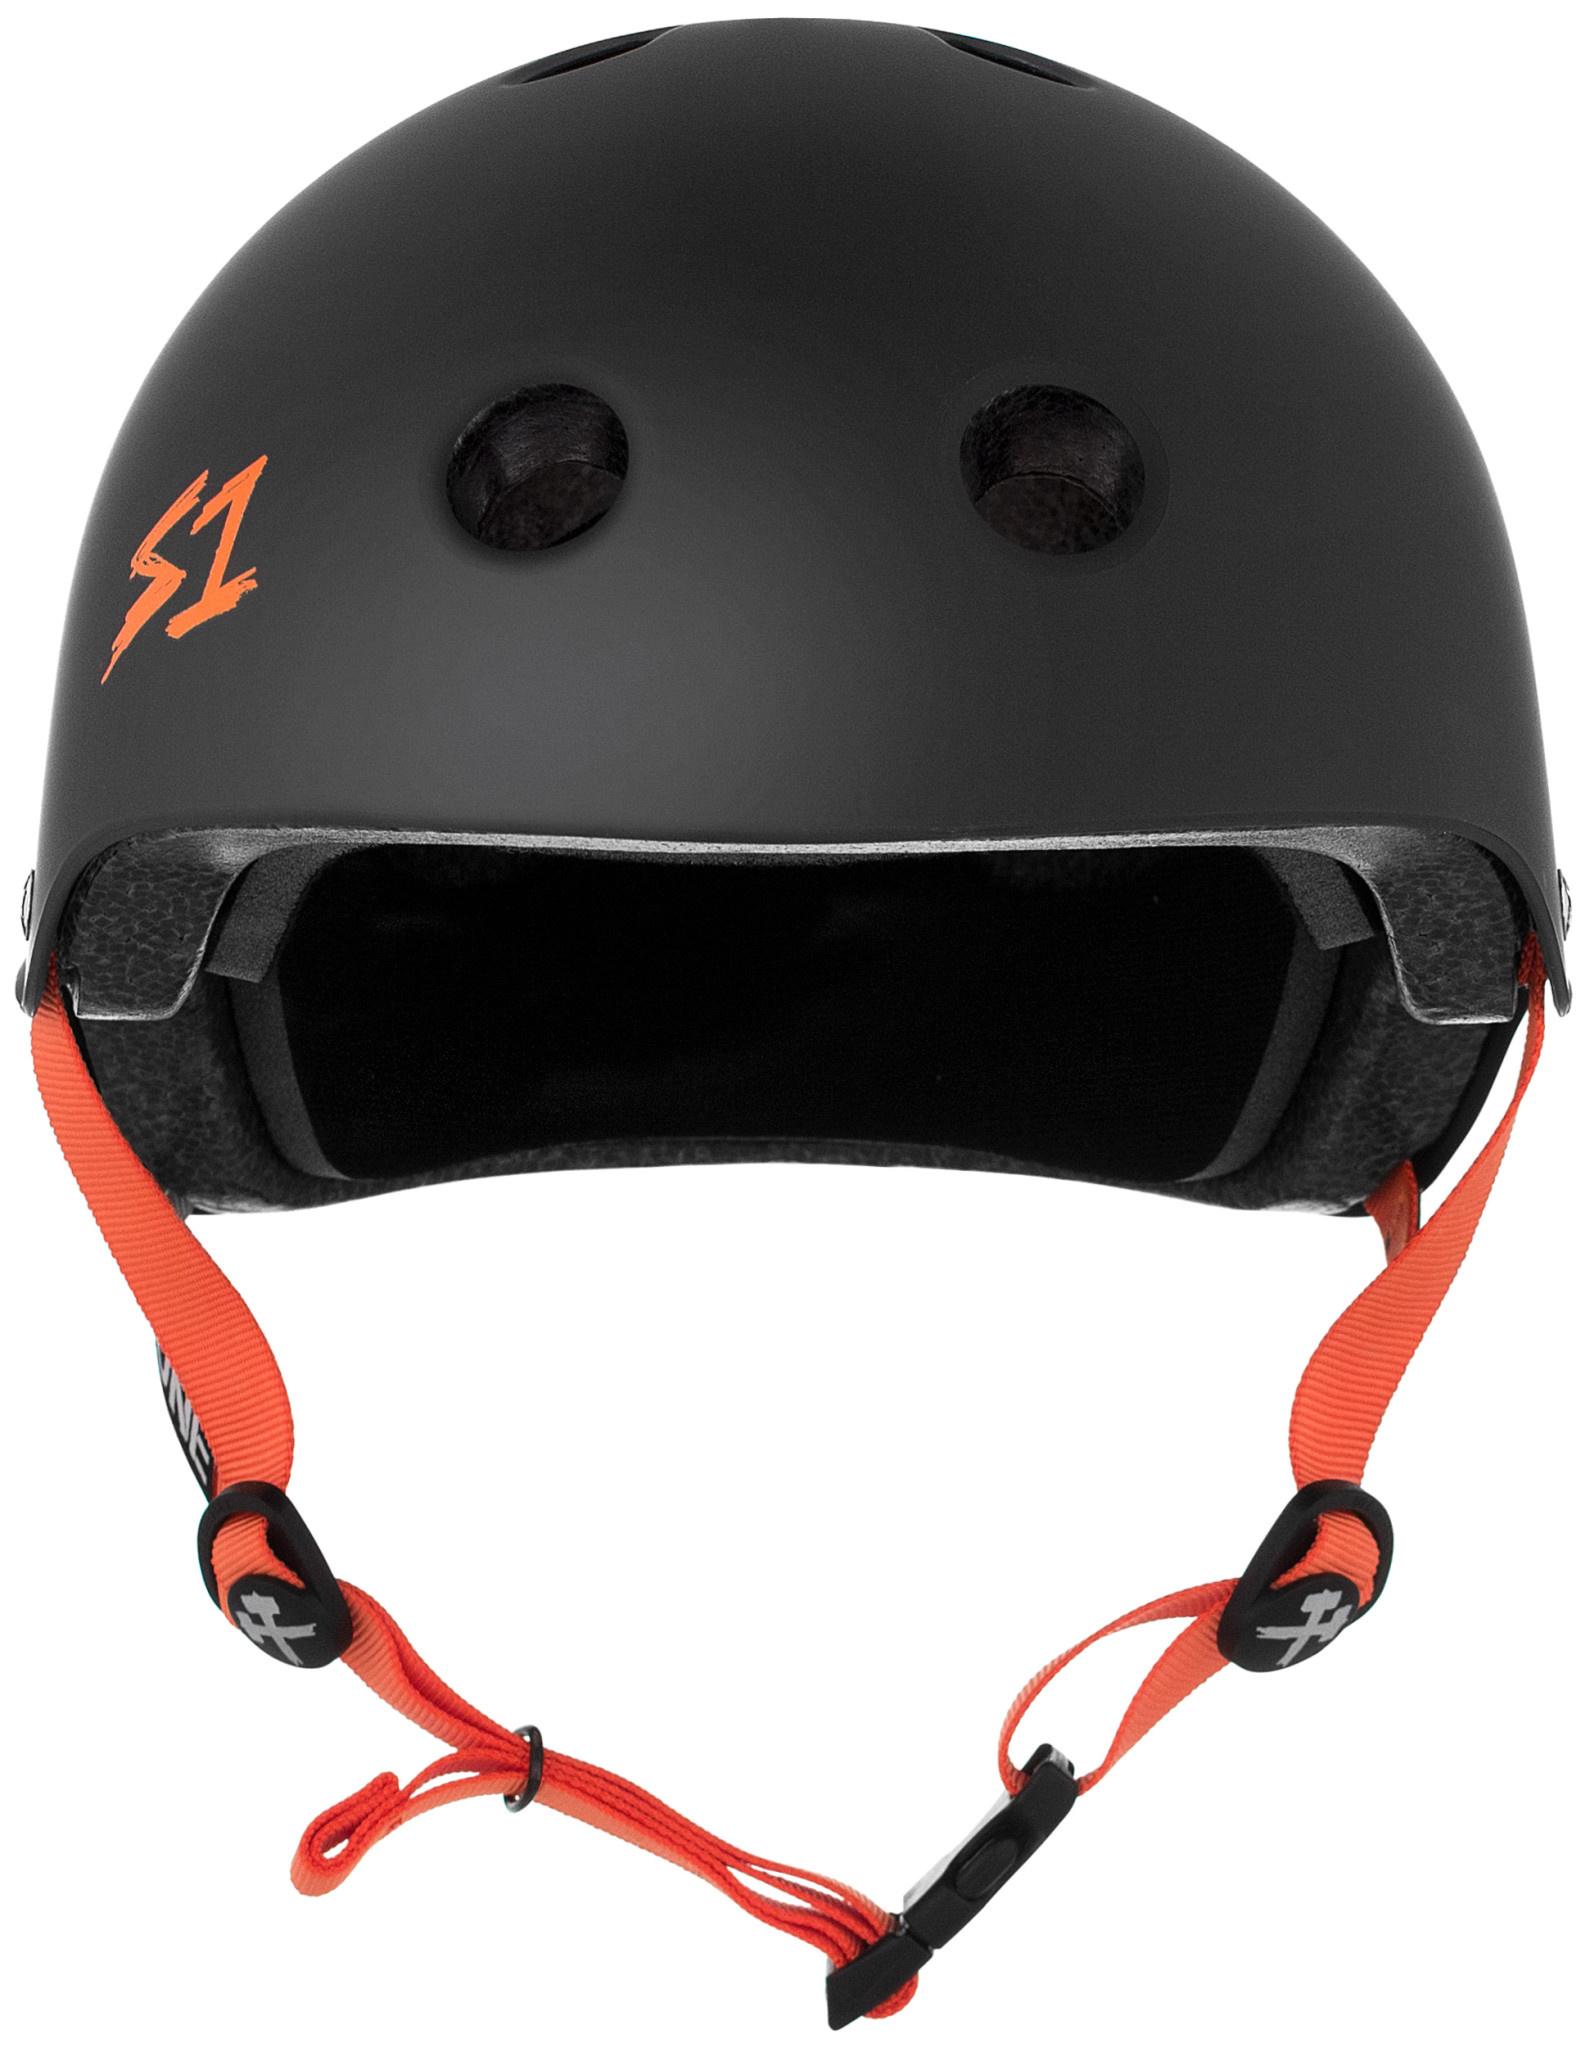 S-1 Lifer Helmet - Black Matte w/ Orange Straps